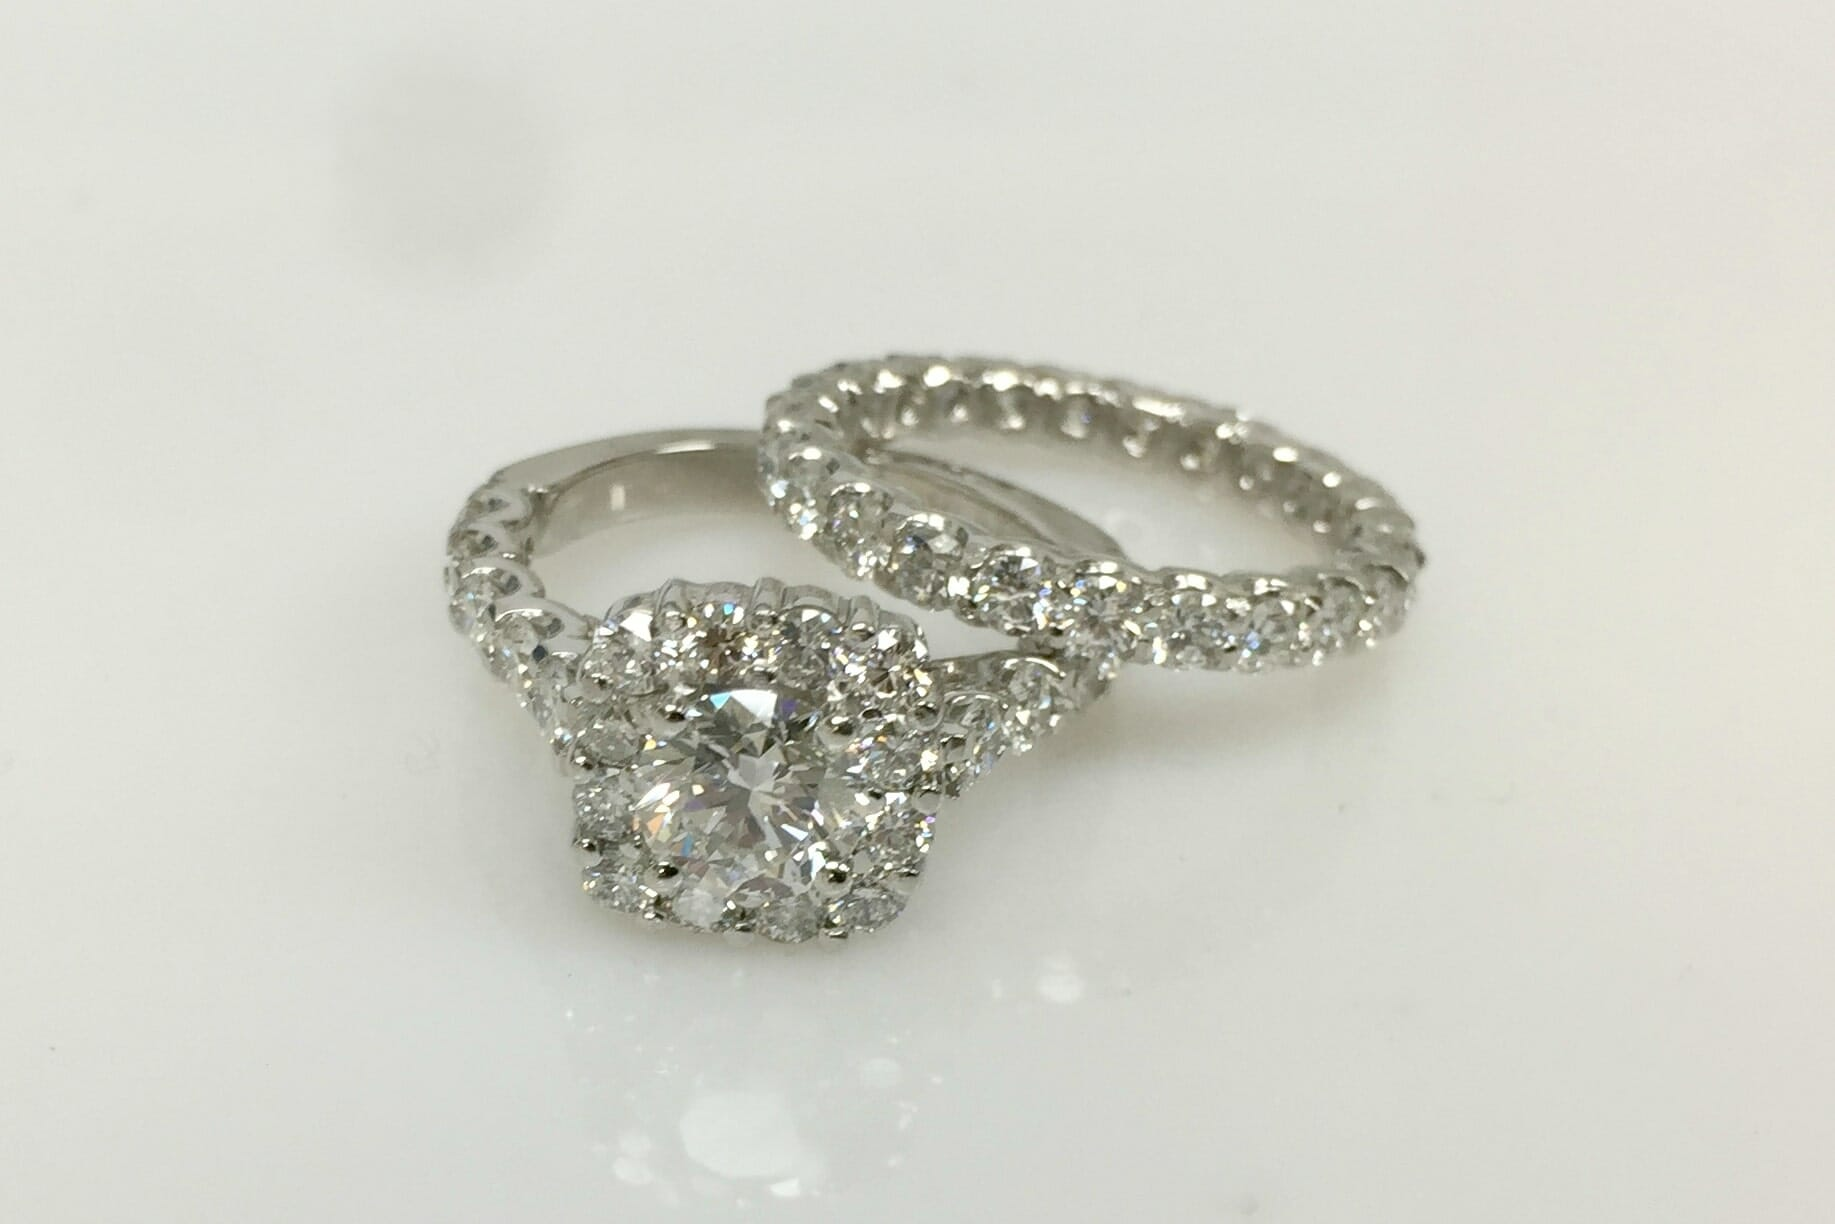 Diamond Halo Engagement Ring With Matching Wedding Band Keezing Kreations